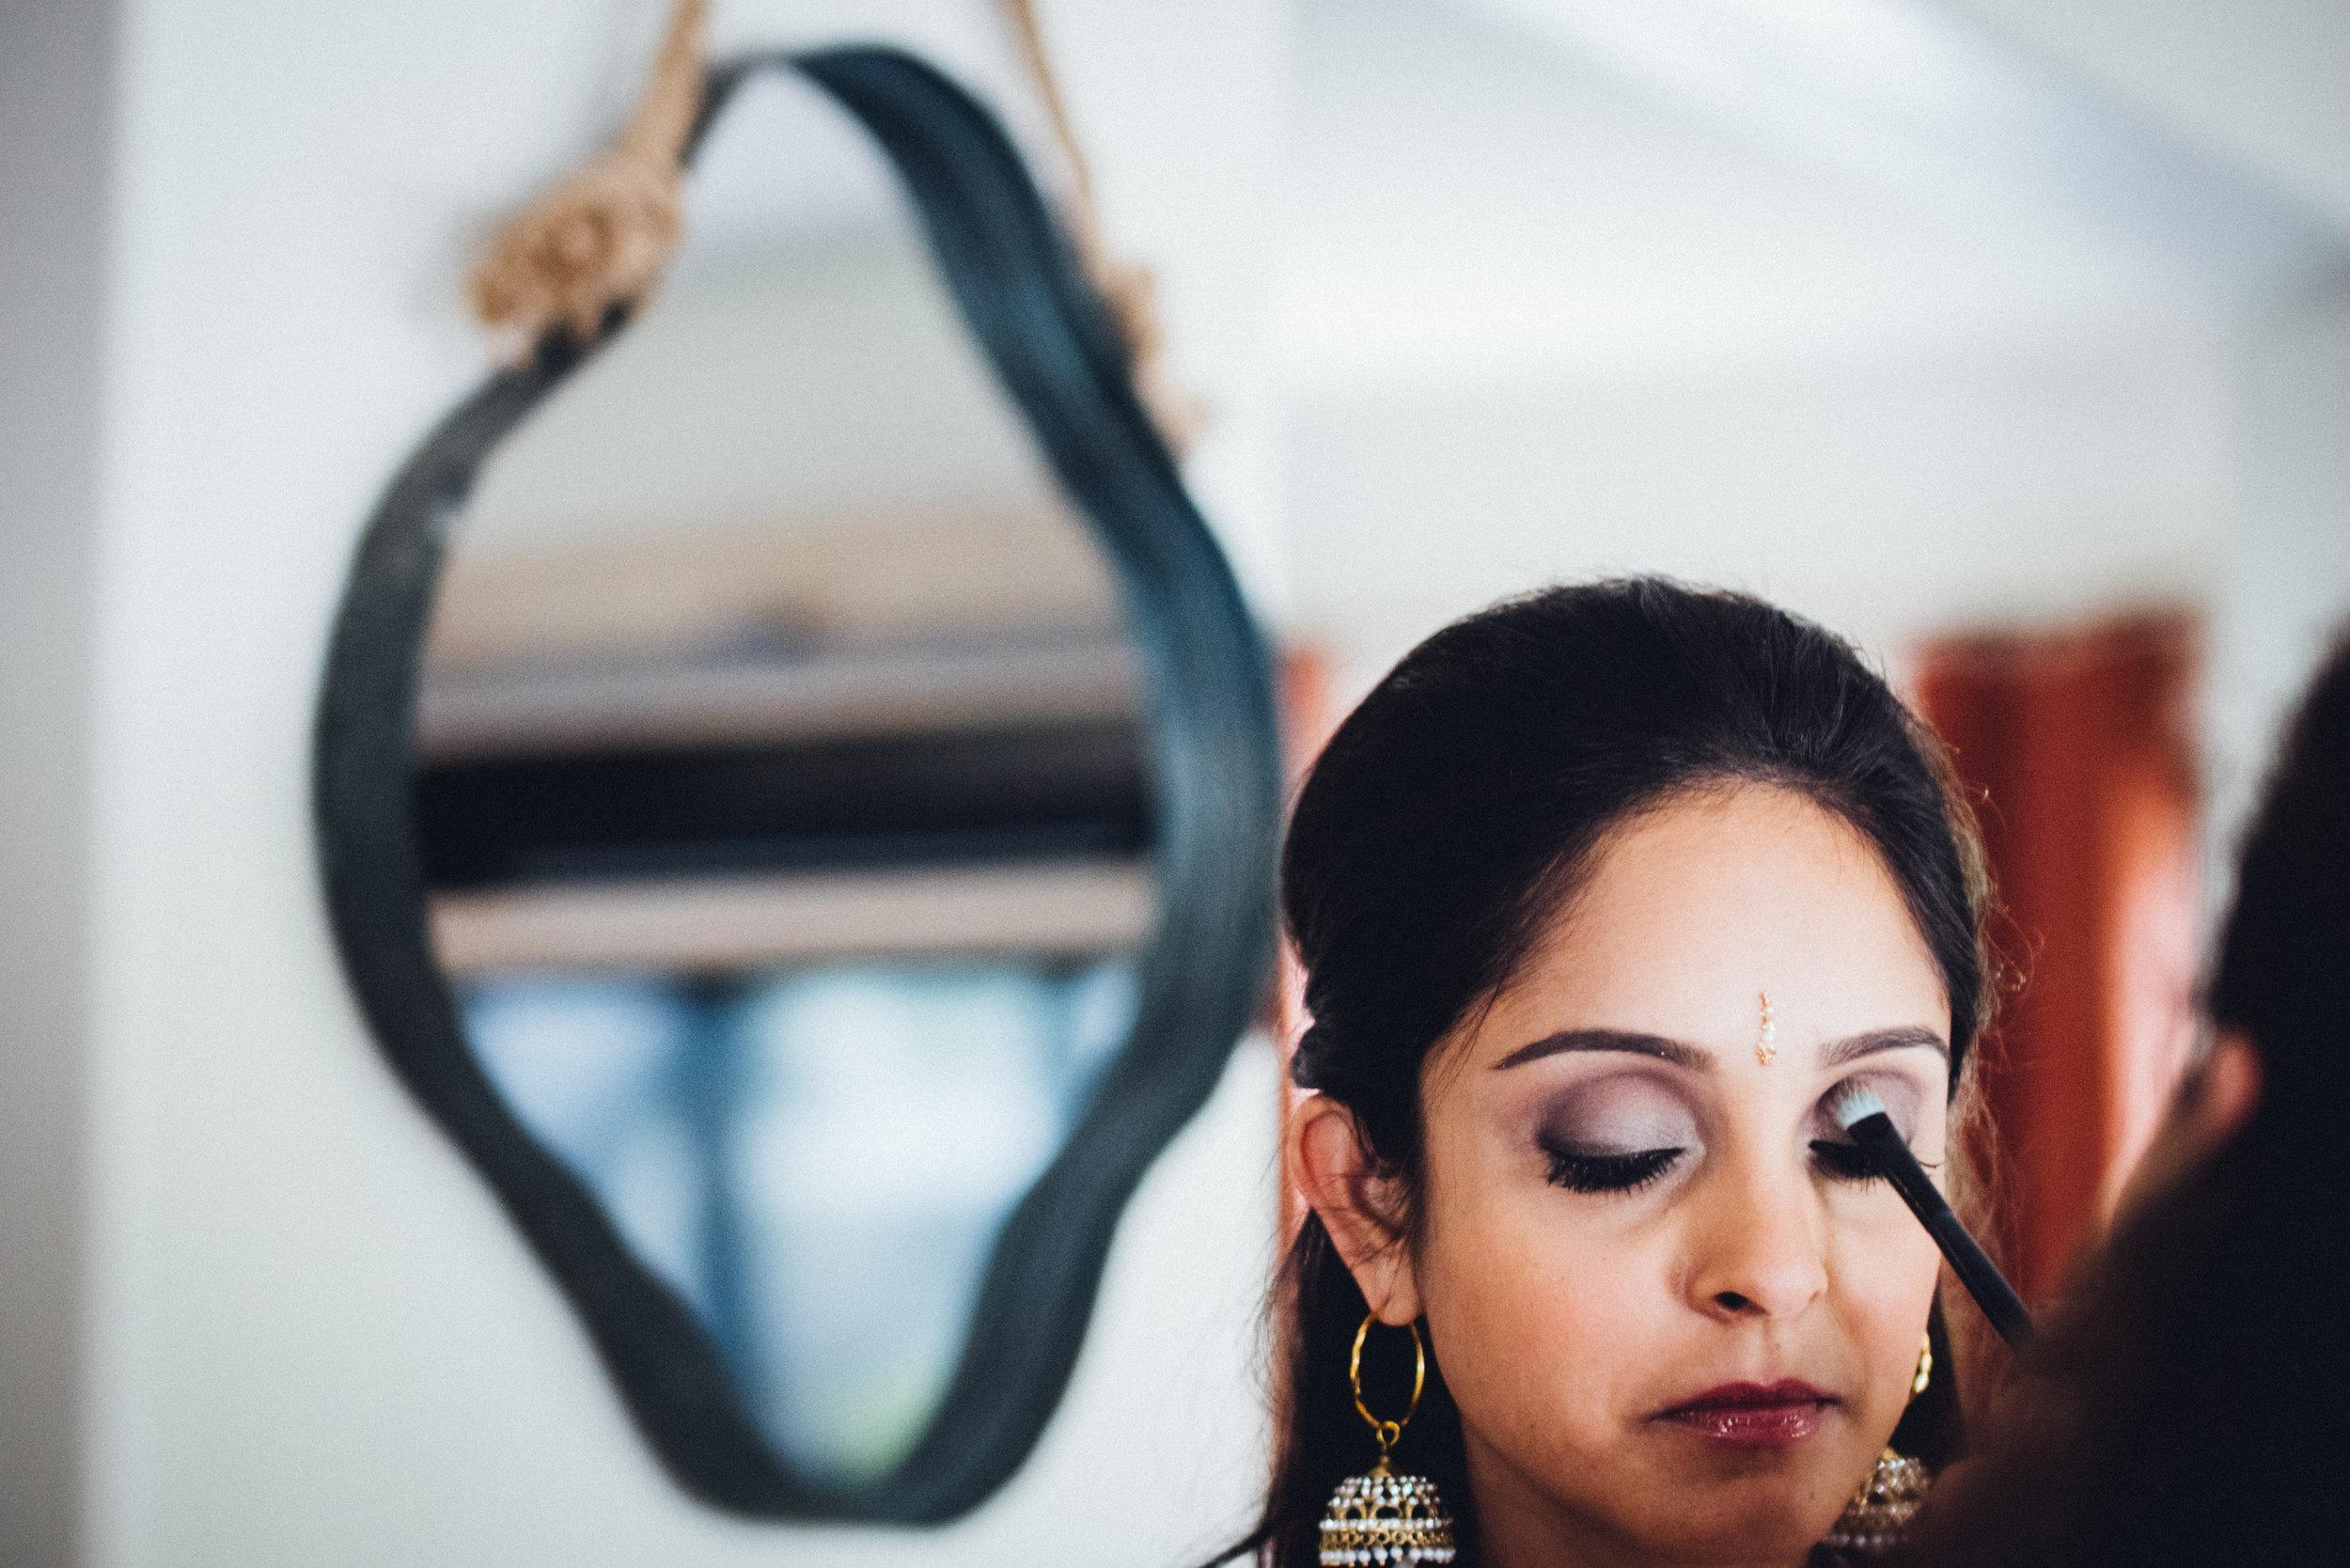 shadow-shine-pictures-meadow-brook-hall-detorit-avani-khristoph-becker-bhatt-wedding-photographer-videographer-cinematographer-michigan